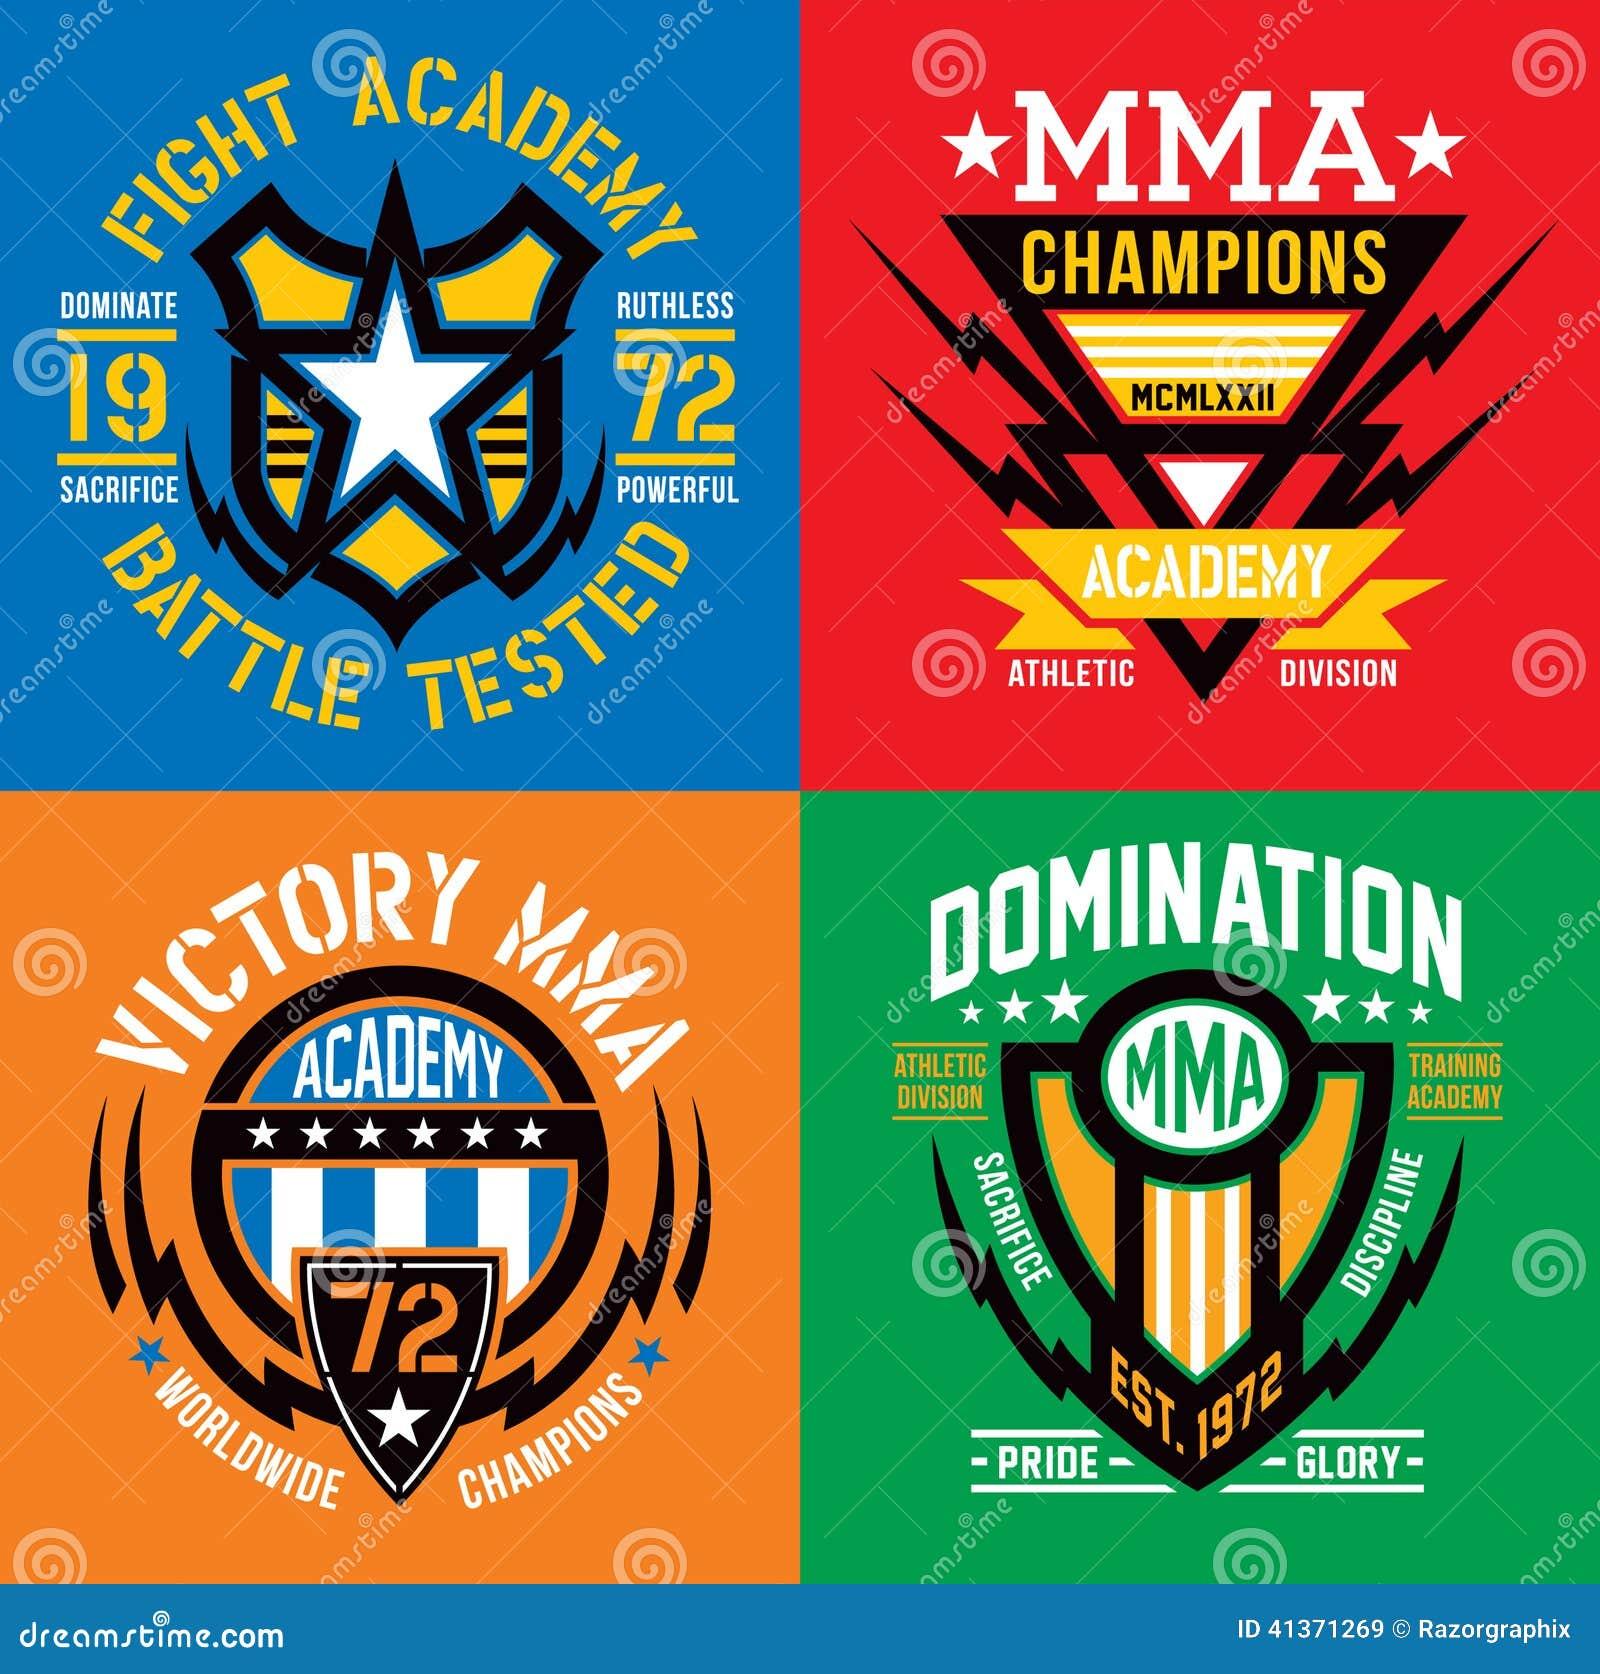 Muttahida Majlis-E-Amal воюют графики эмблемы академии